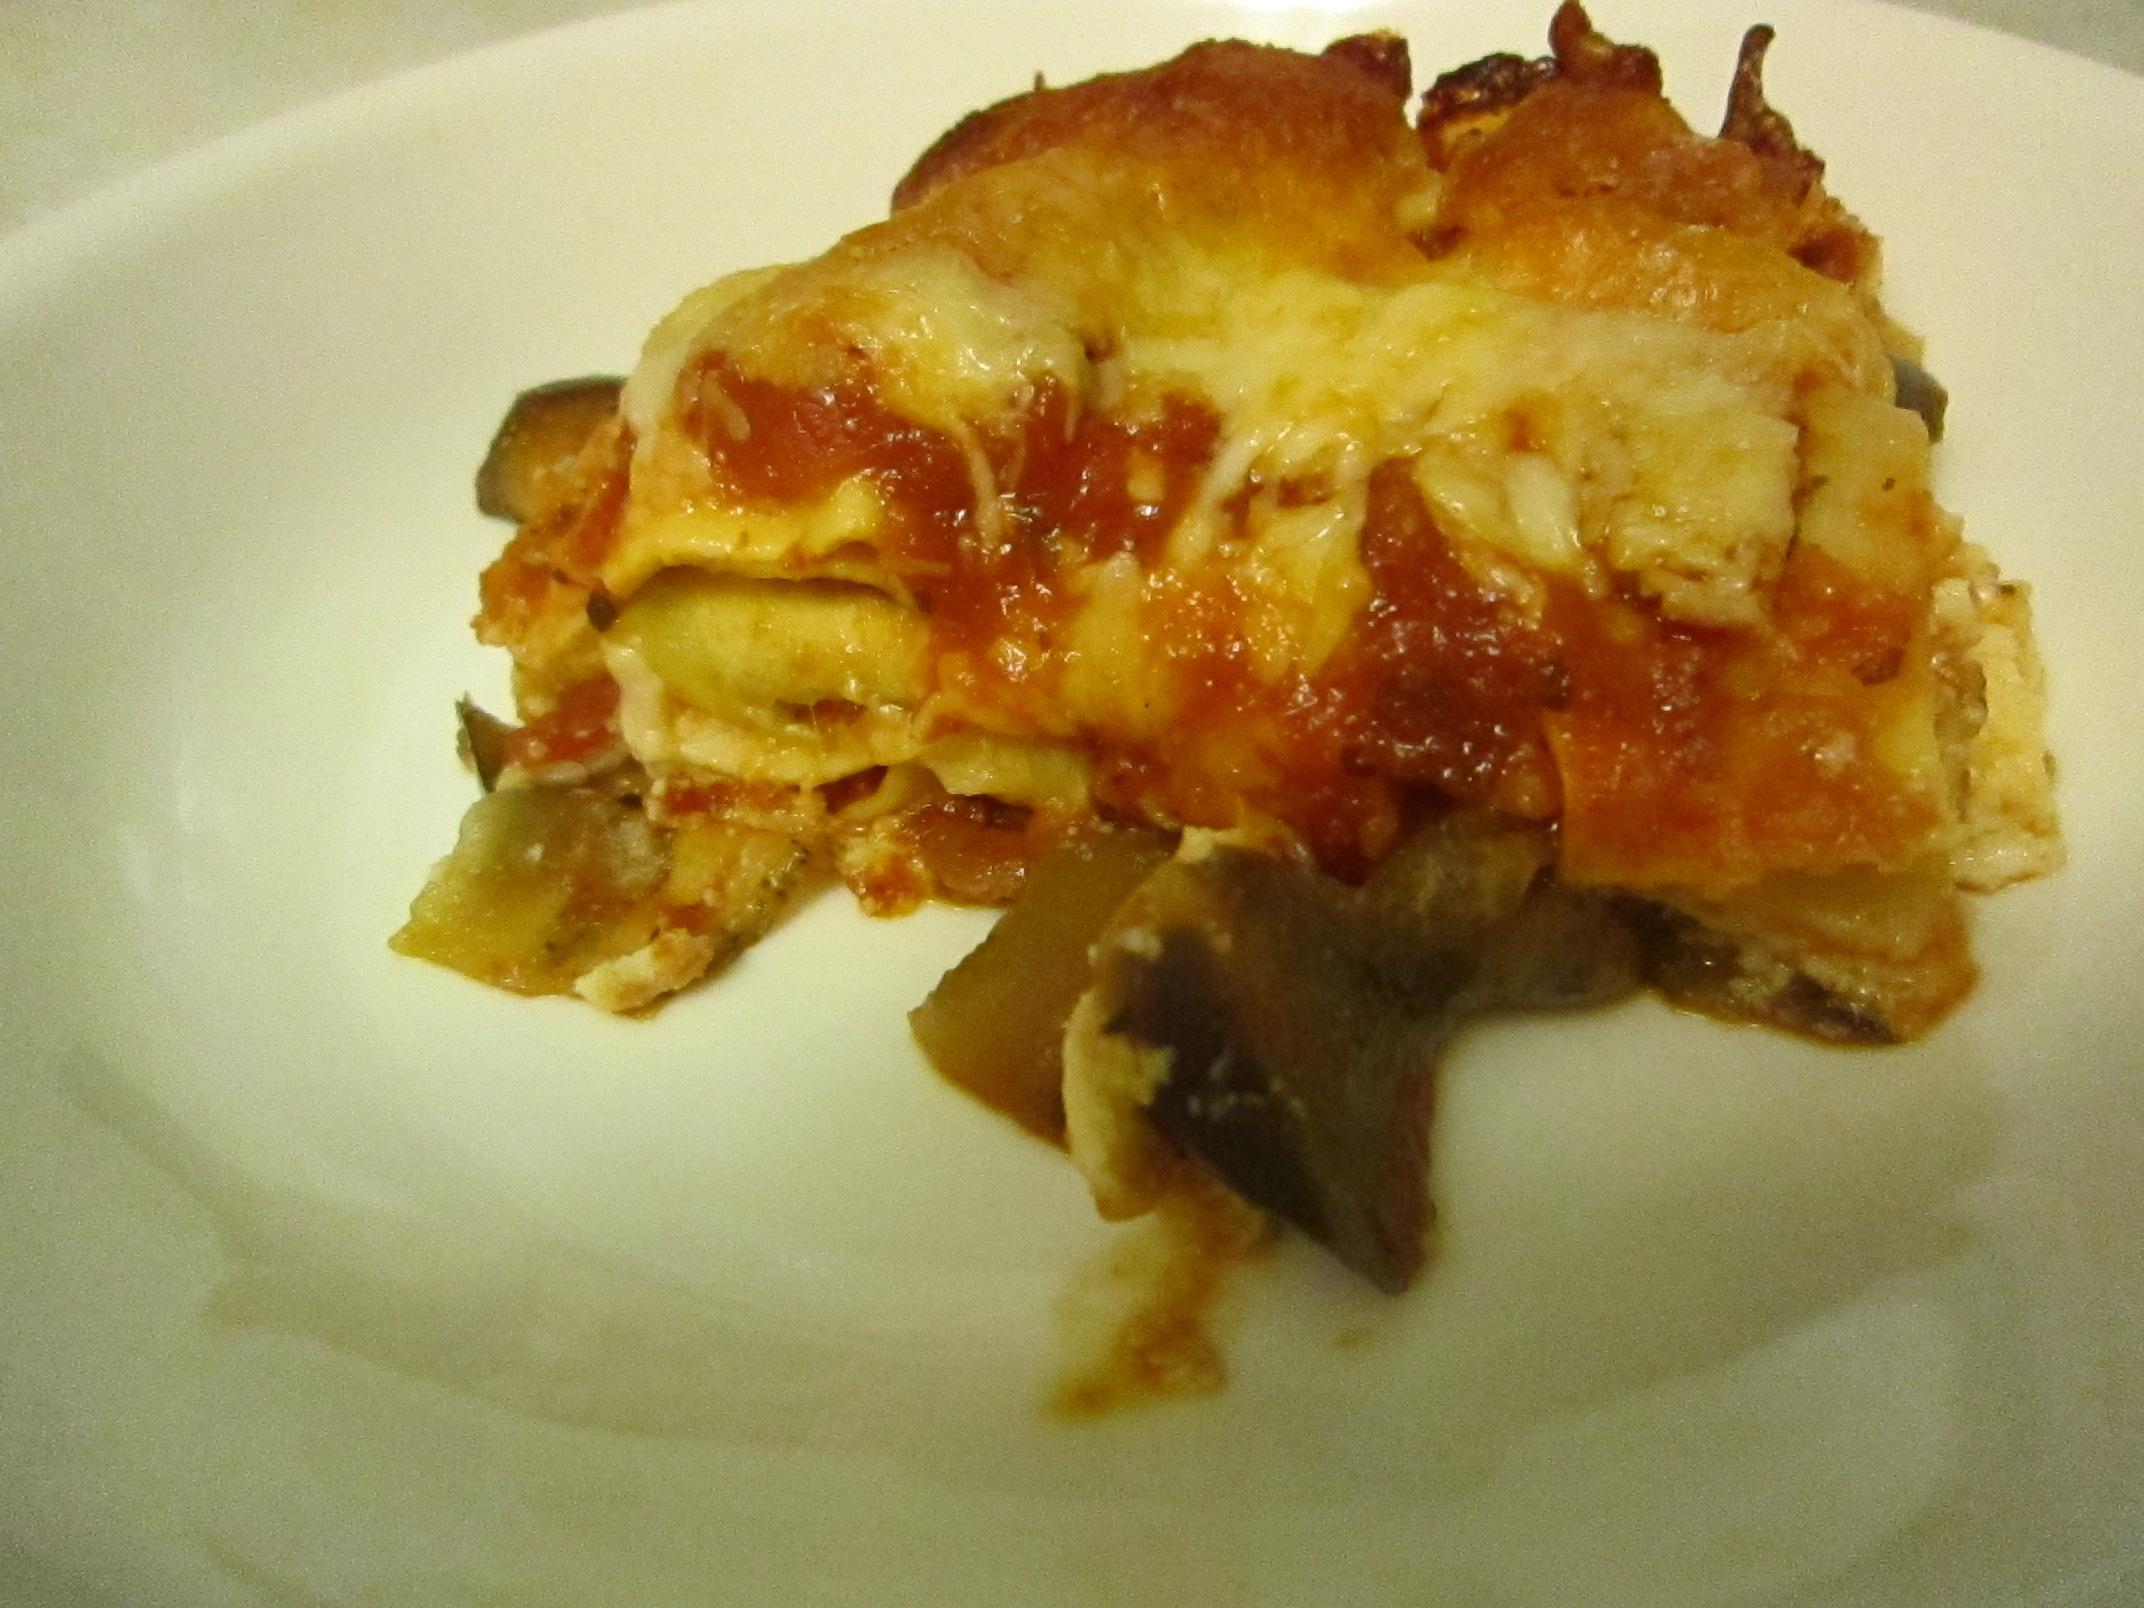 eggplant lasagna kate eats kale  substitute yogurt for cottage cheese in lasagna